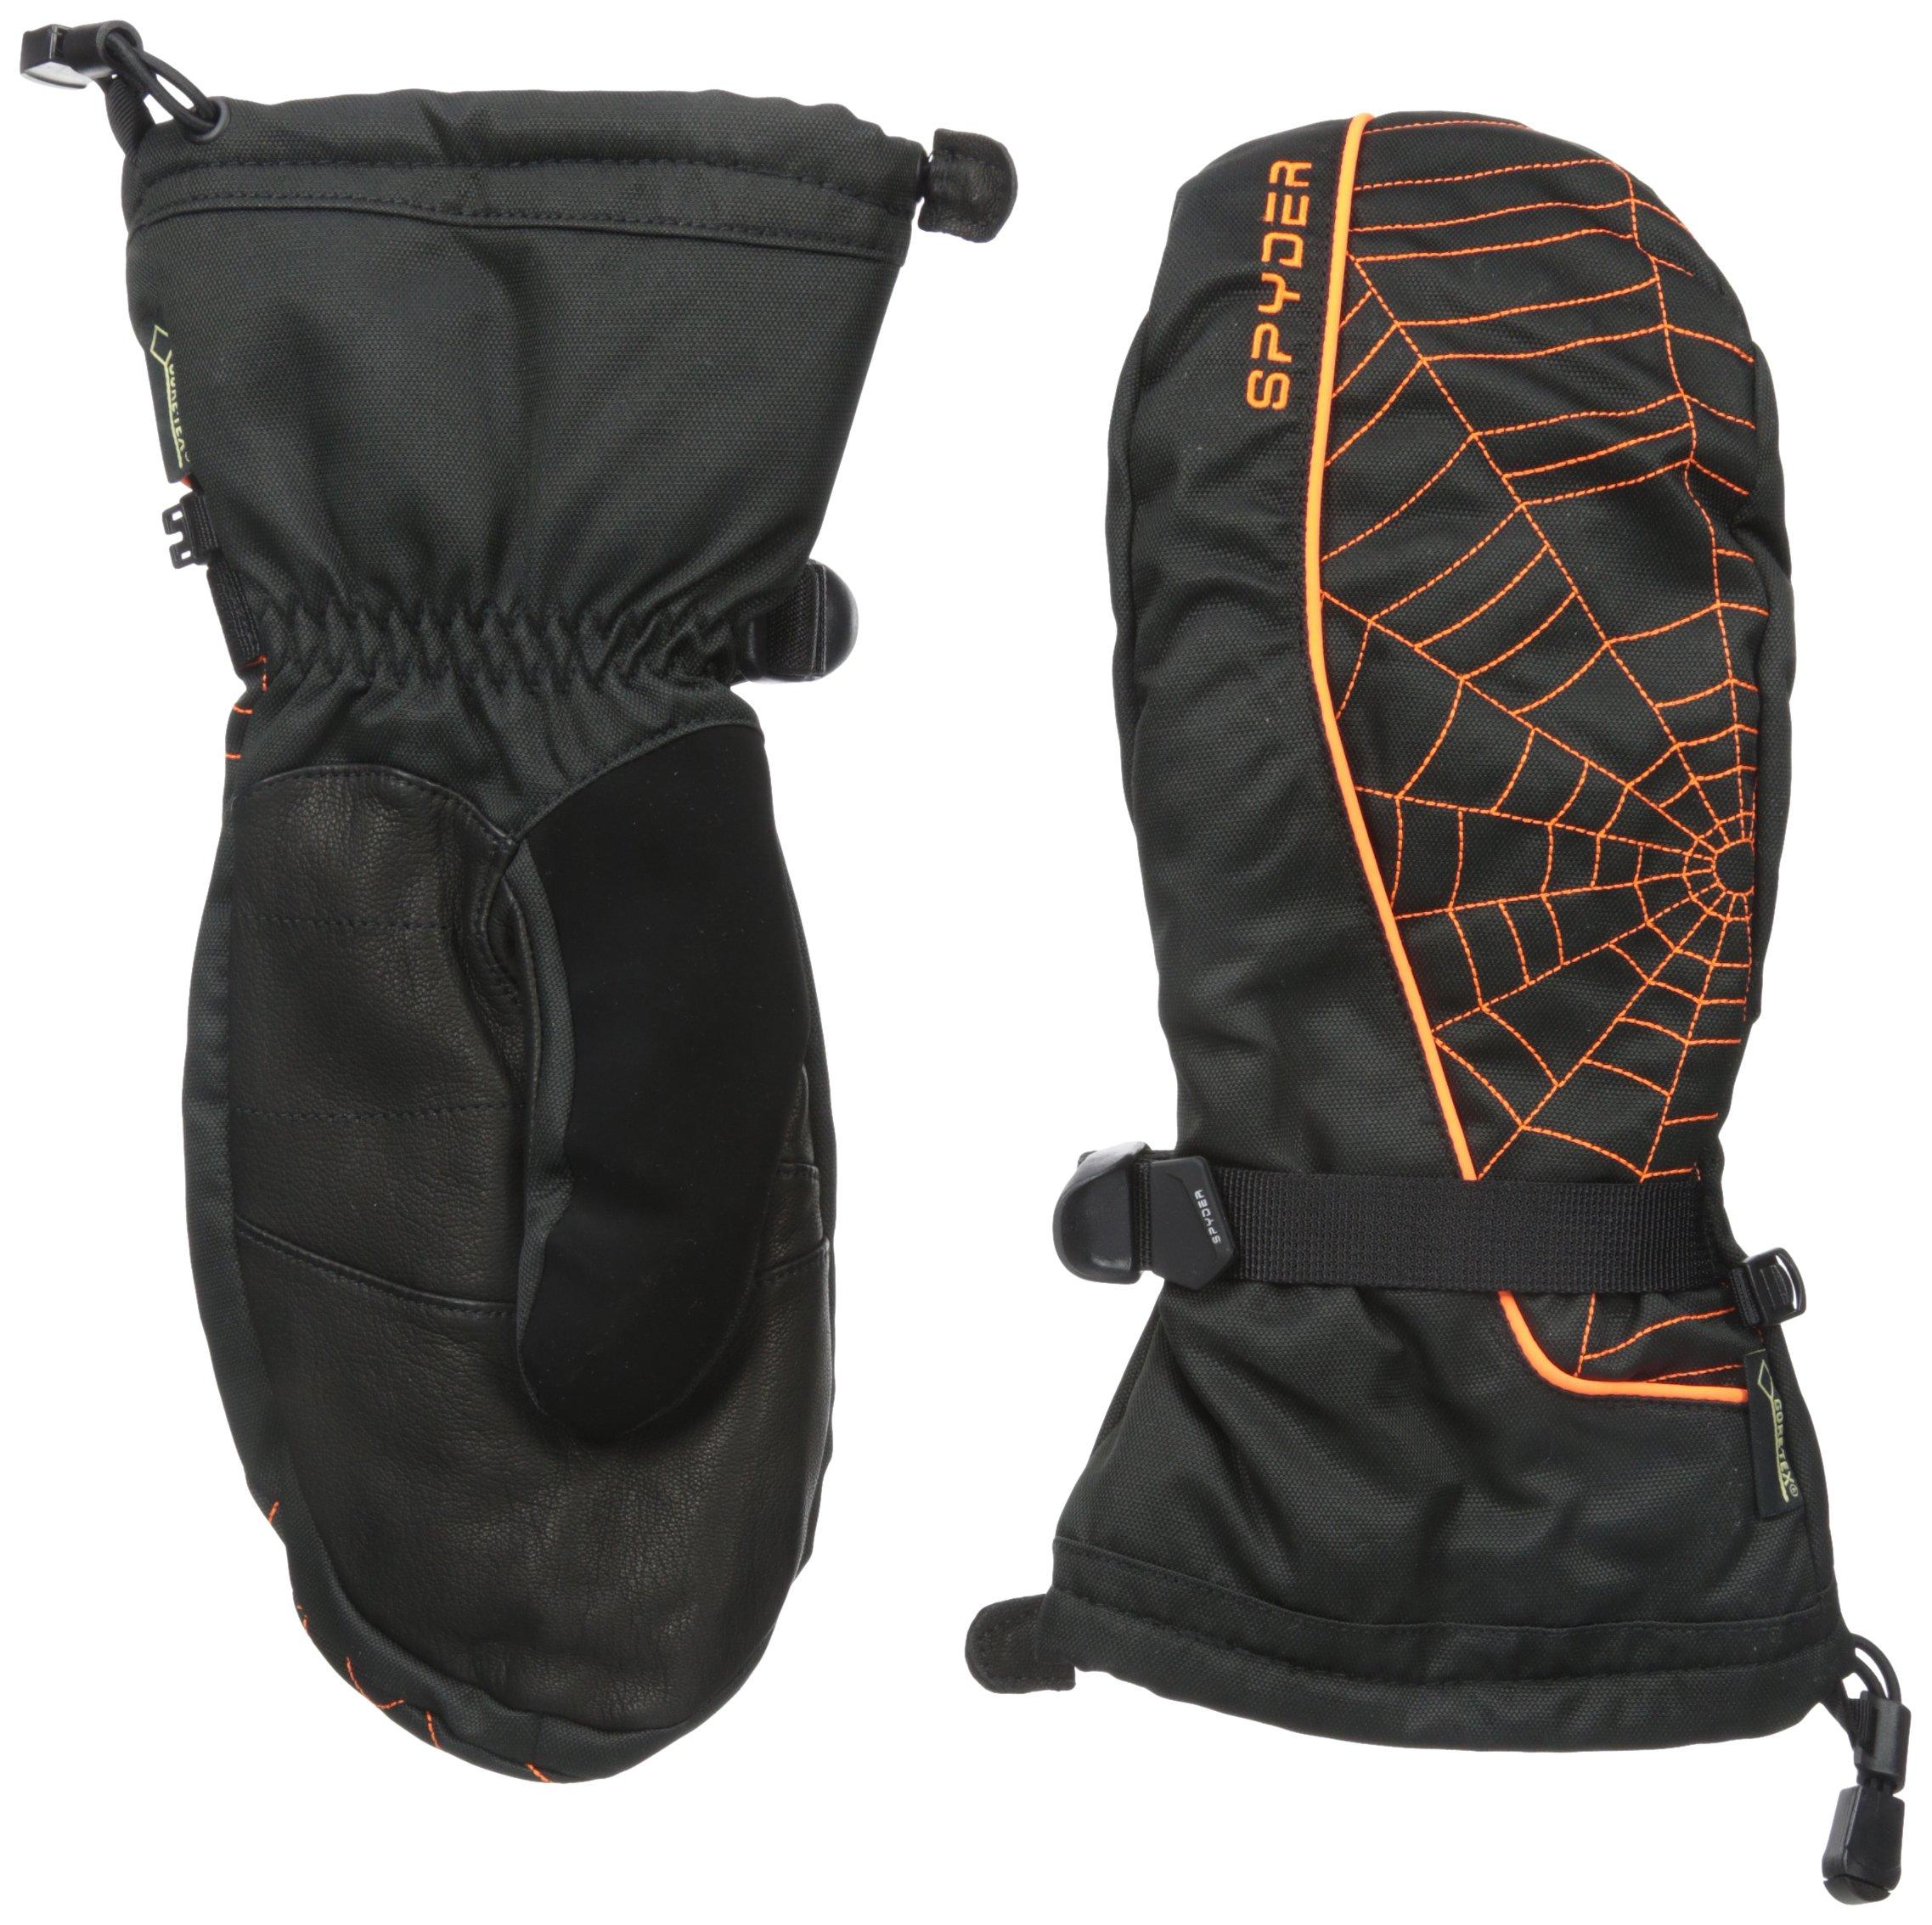 Spyder Men's Overweb Glove, Black/Bryte Orange, Large